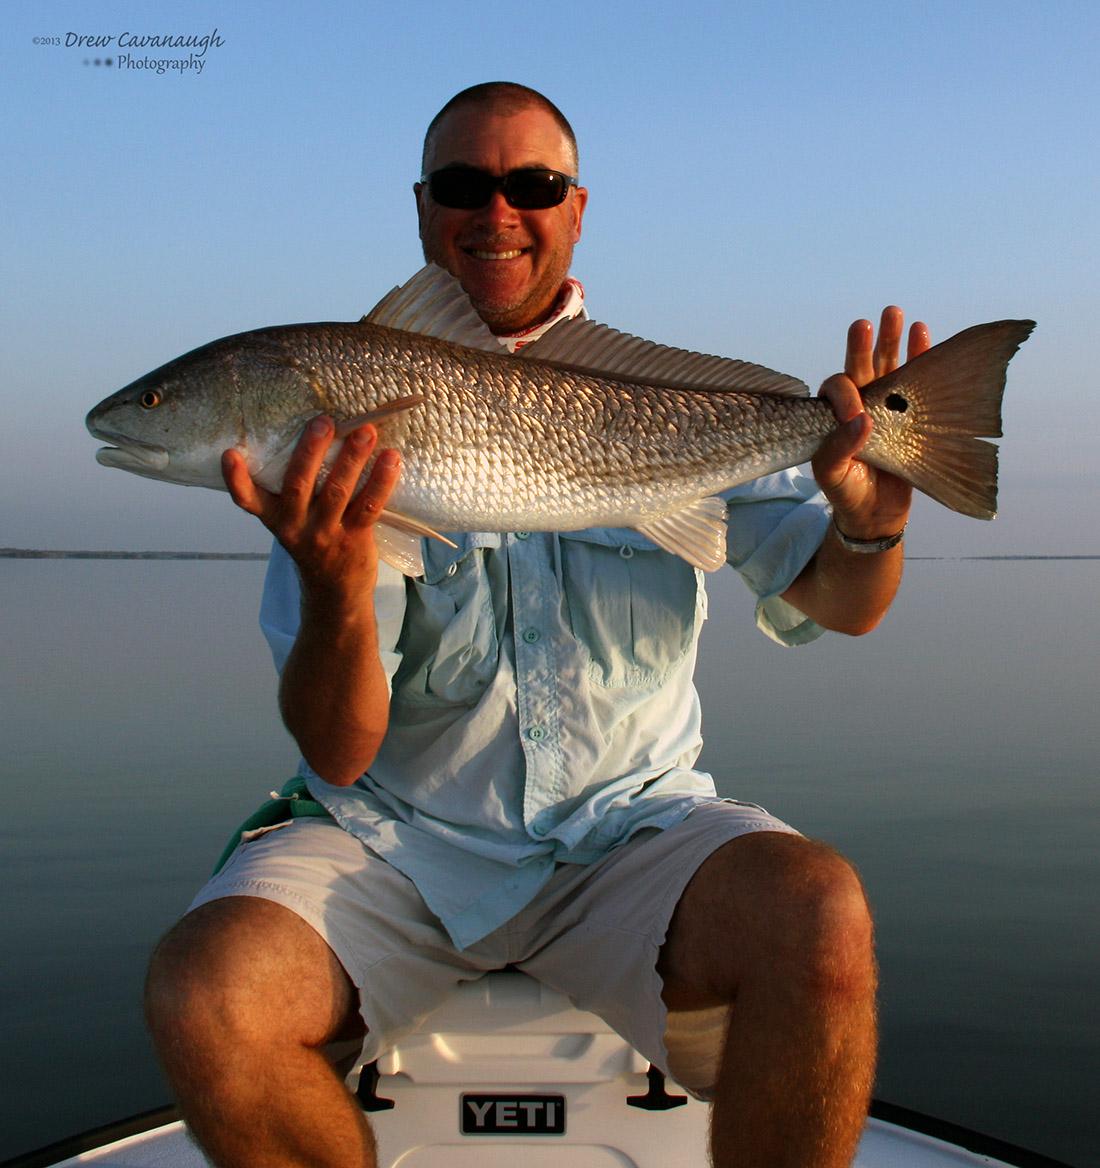 Mosquito lagoon flats fishing charters fishing daytona for New smyrna fishing charters